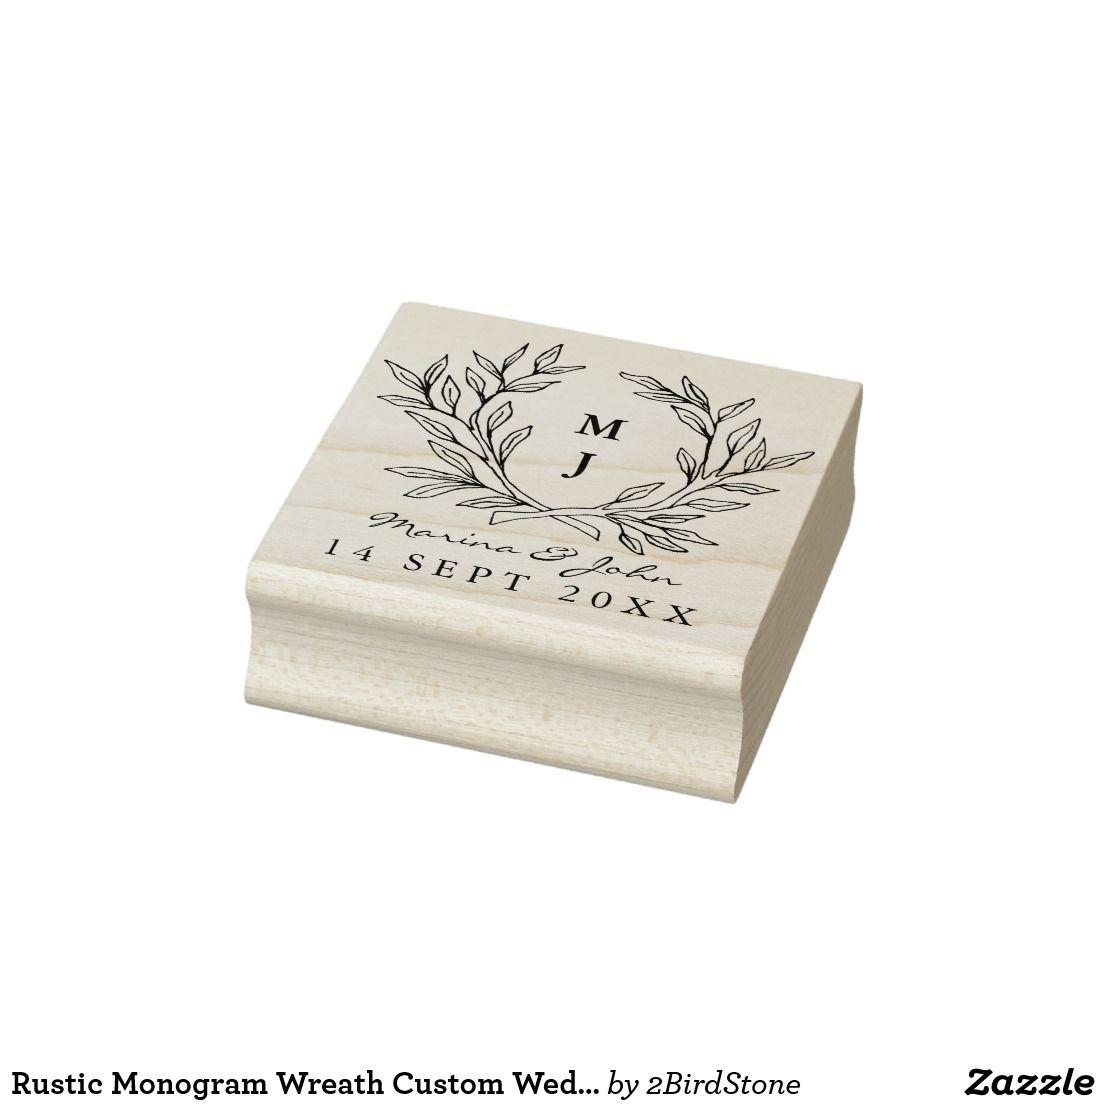 Rustic Monogram Wreath Custom Wedding Rubber Stamp